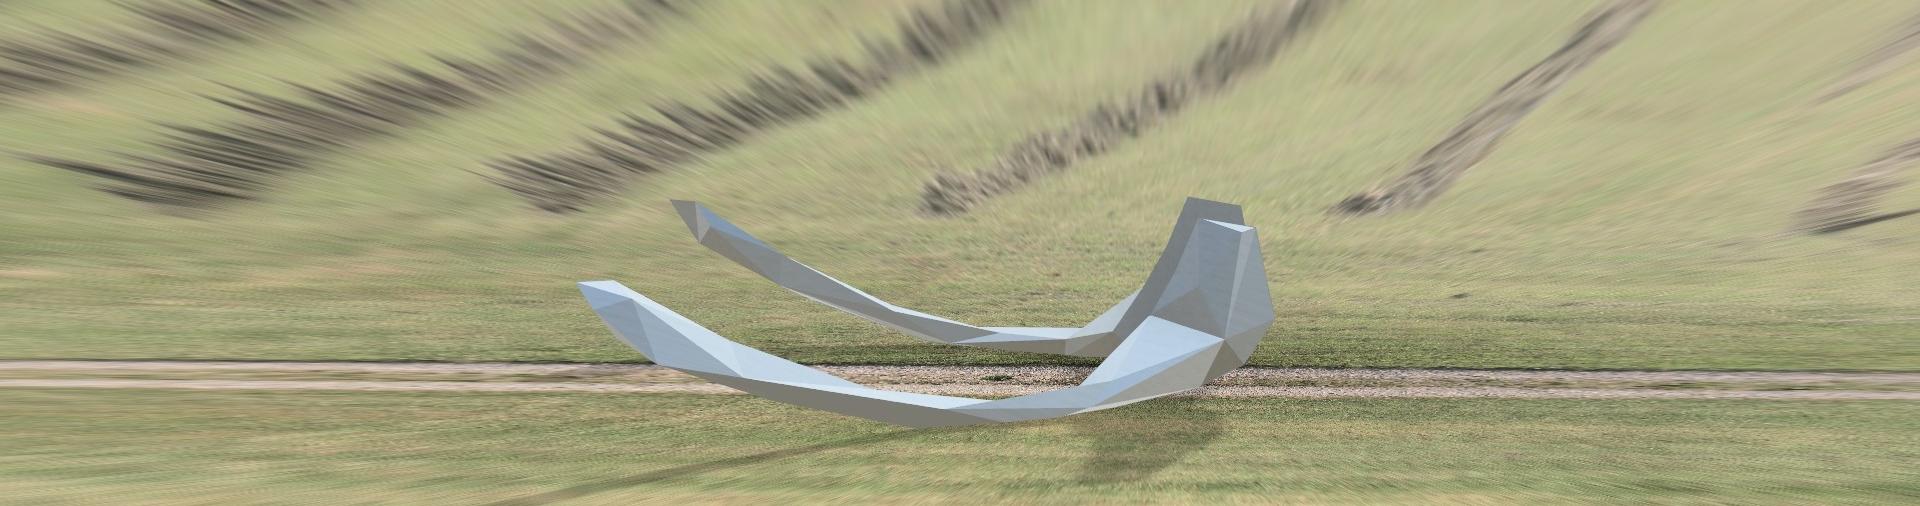 Wishbone Washoe Trailhead Angle field extreme-18.jpg